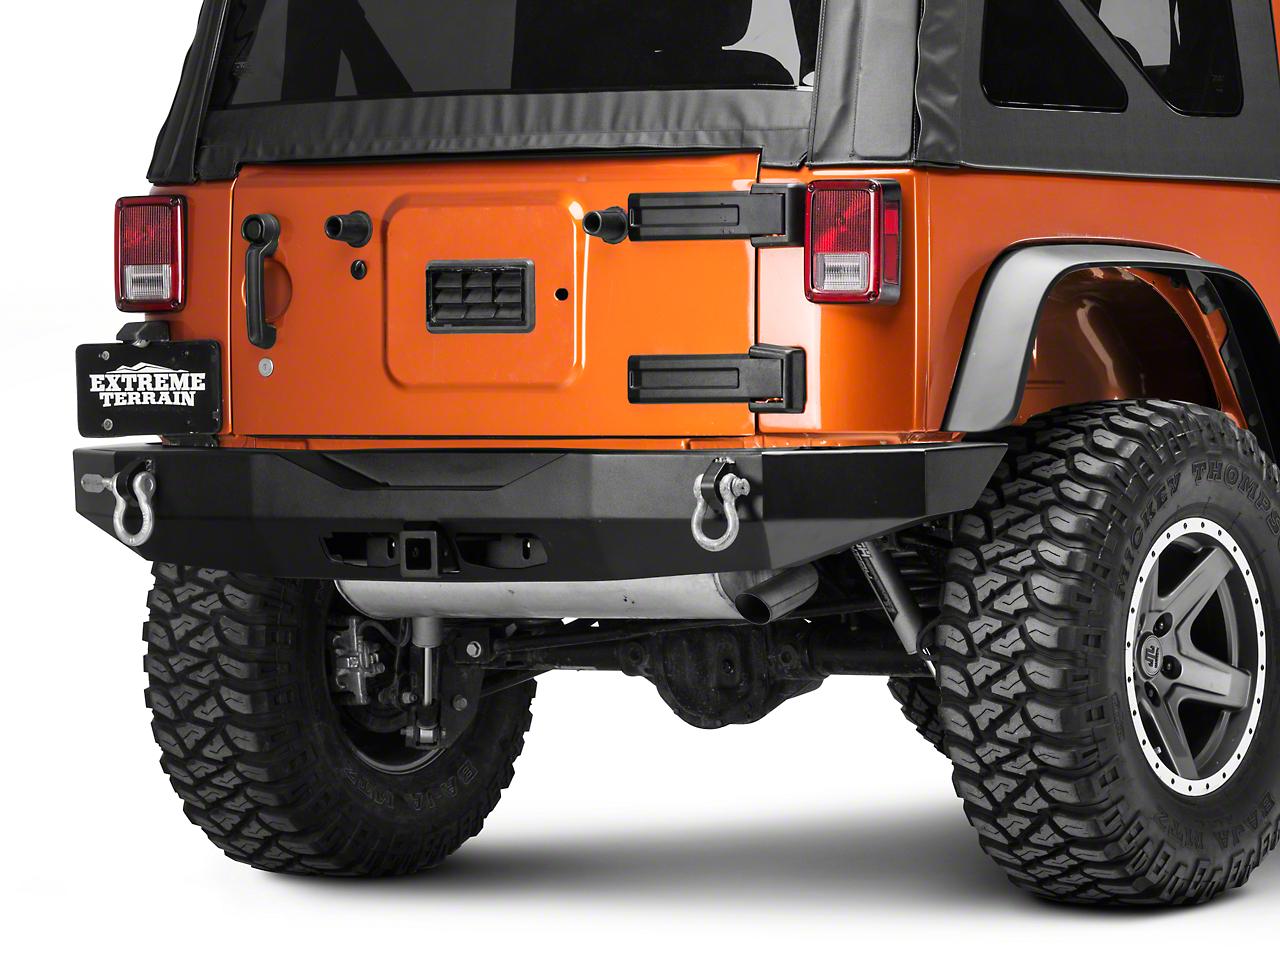 Rock-Slide Engineering Aluminum Rigid Rear Bumper w/out Tire Carrier (07-18 Wrangler JK)